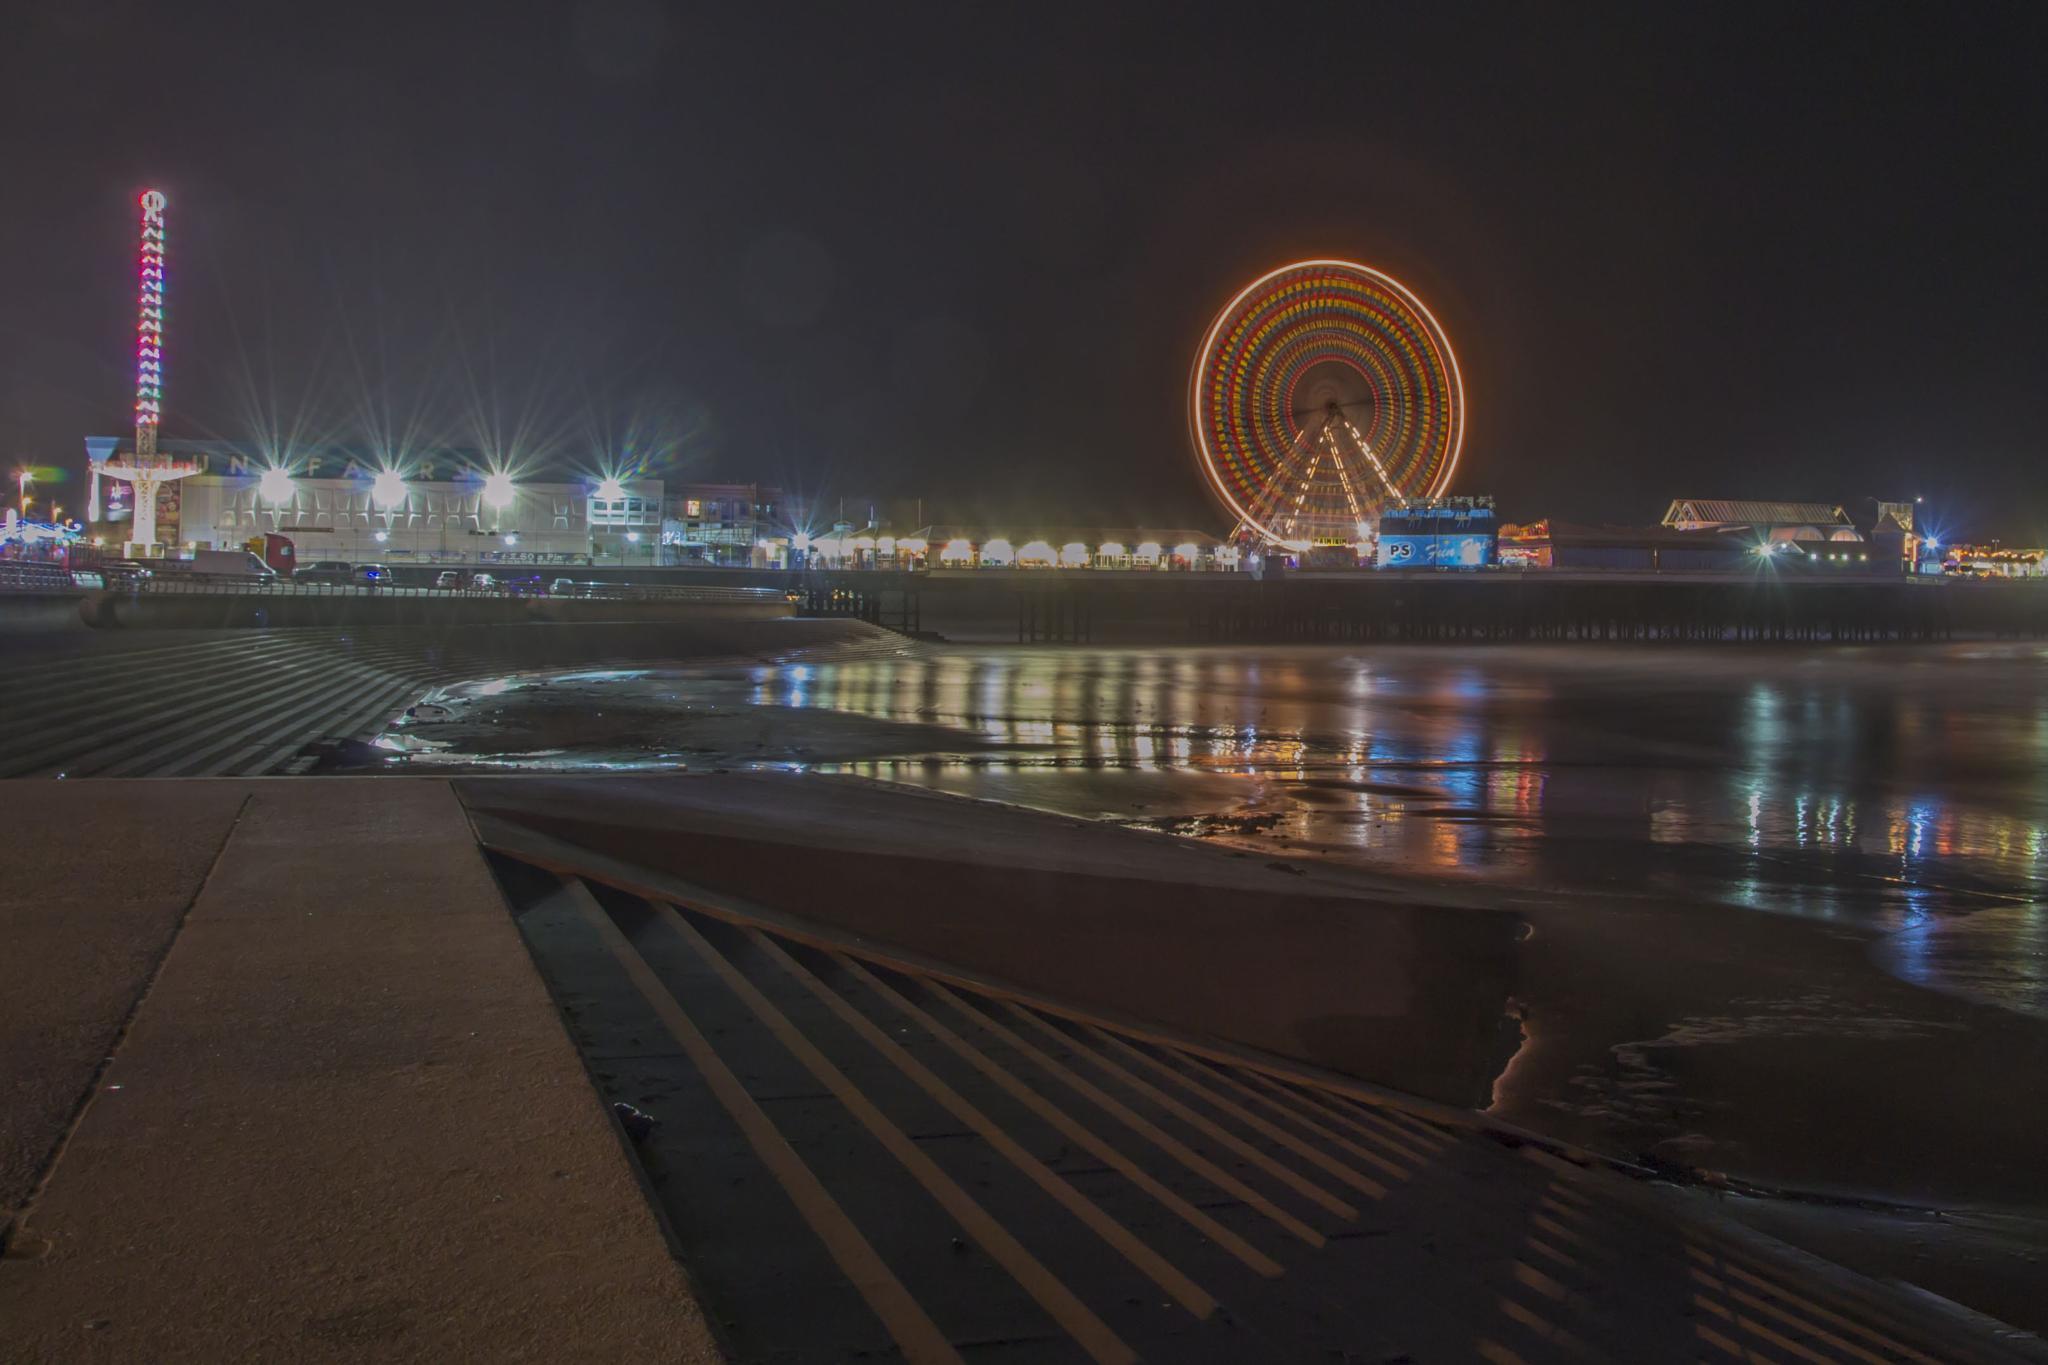 North Pier @ Blackpool by Paul Ruddock